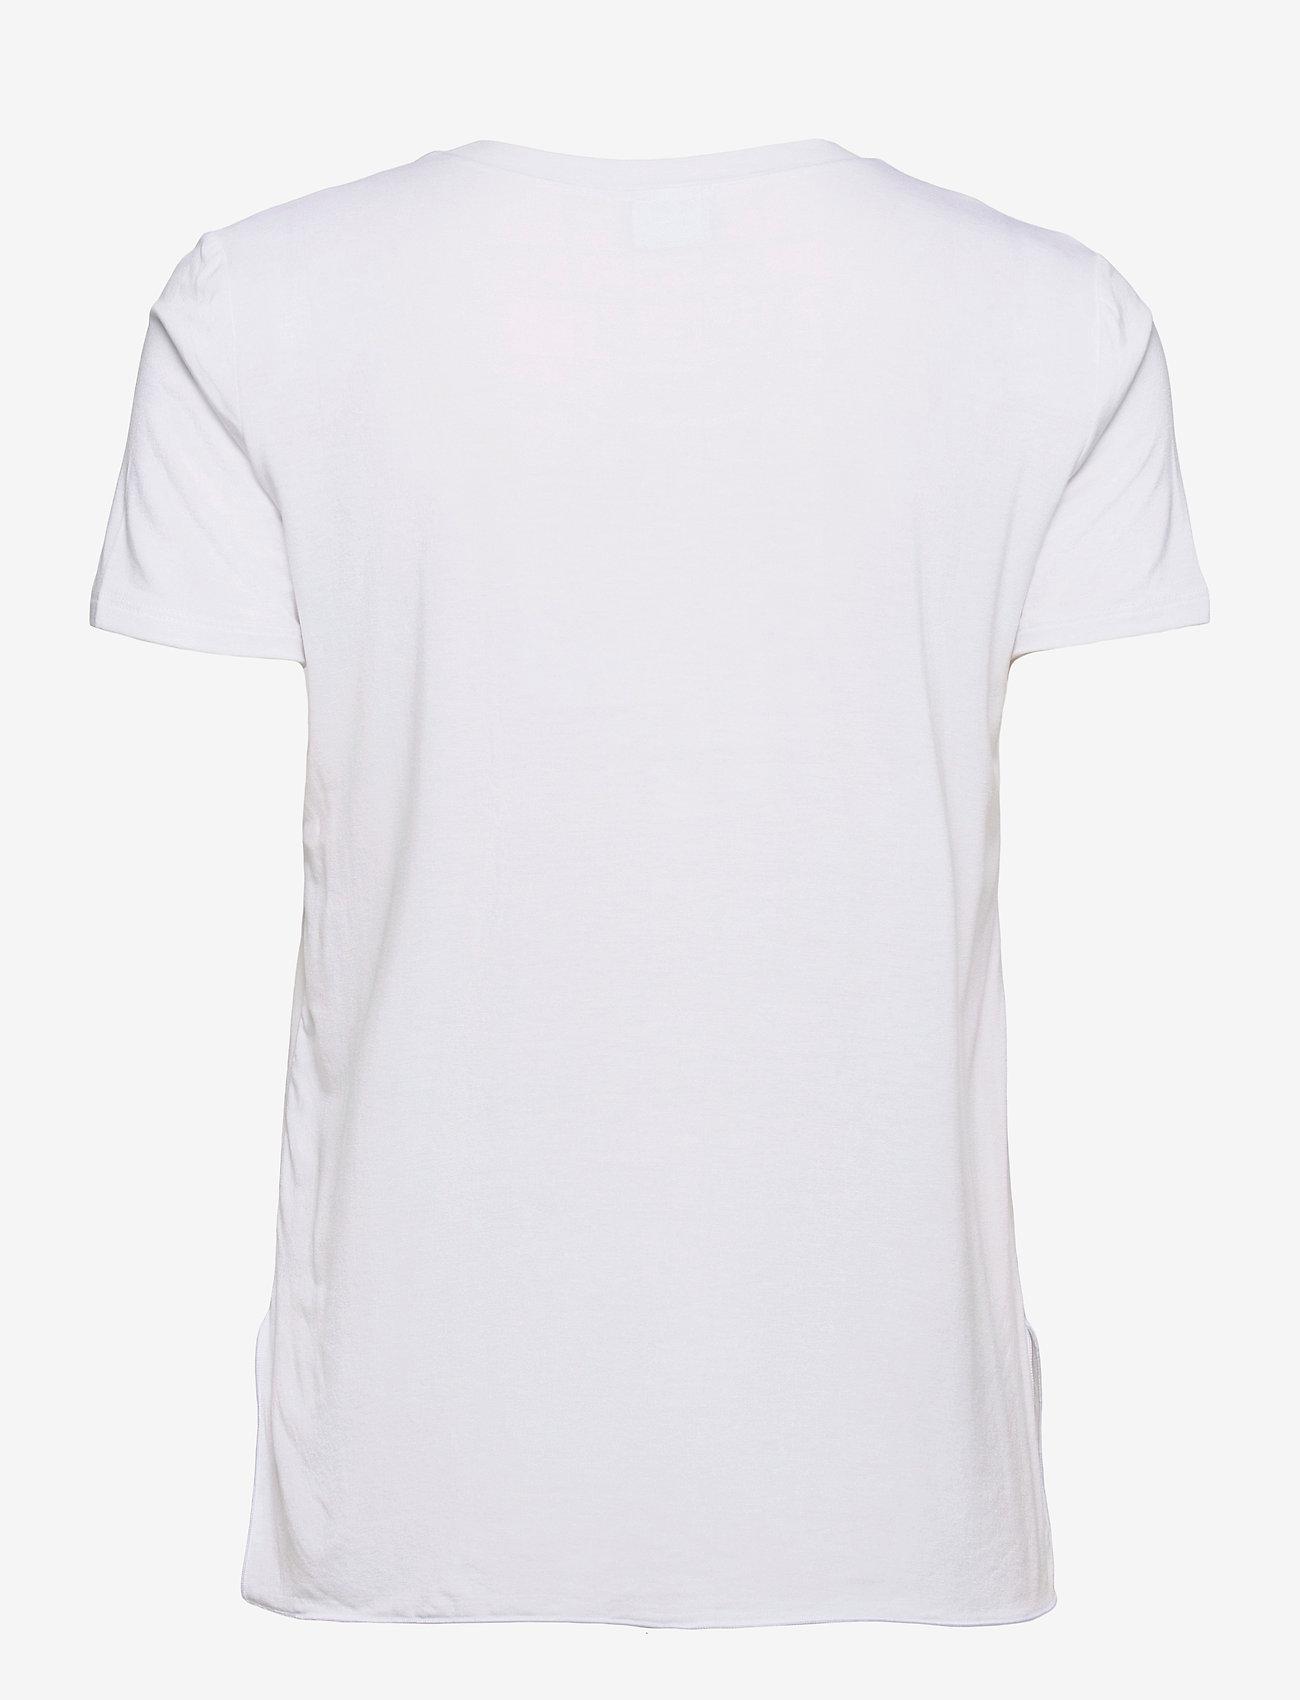 Max Mara Leisure - POSATO - t-shirts - optical white - 1